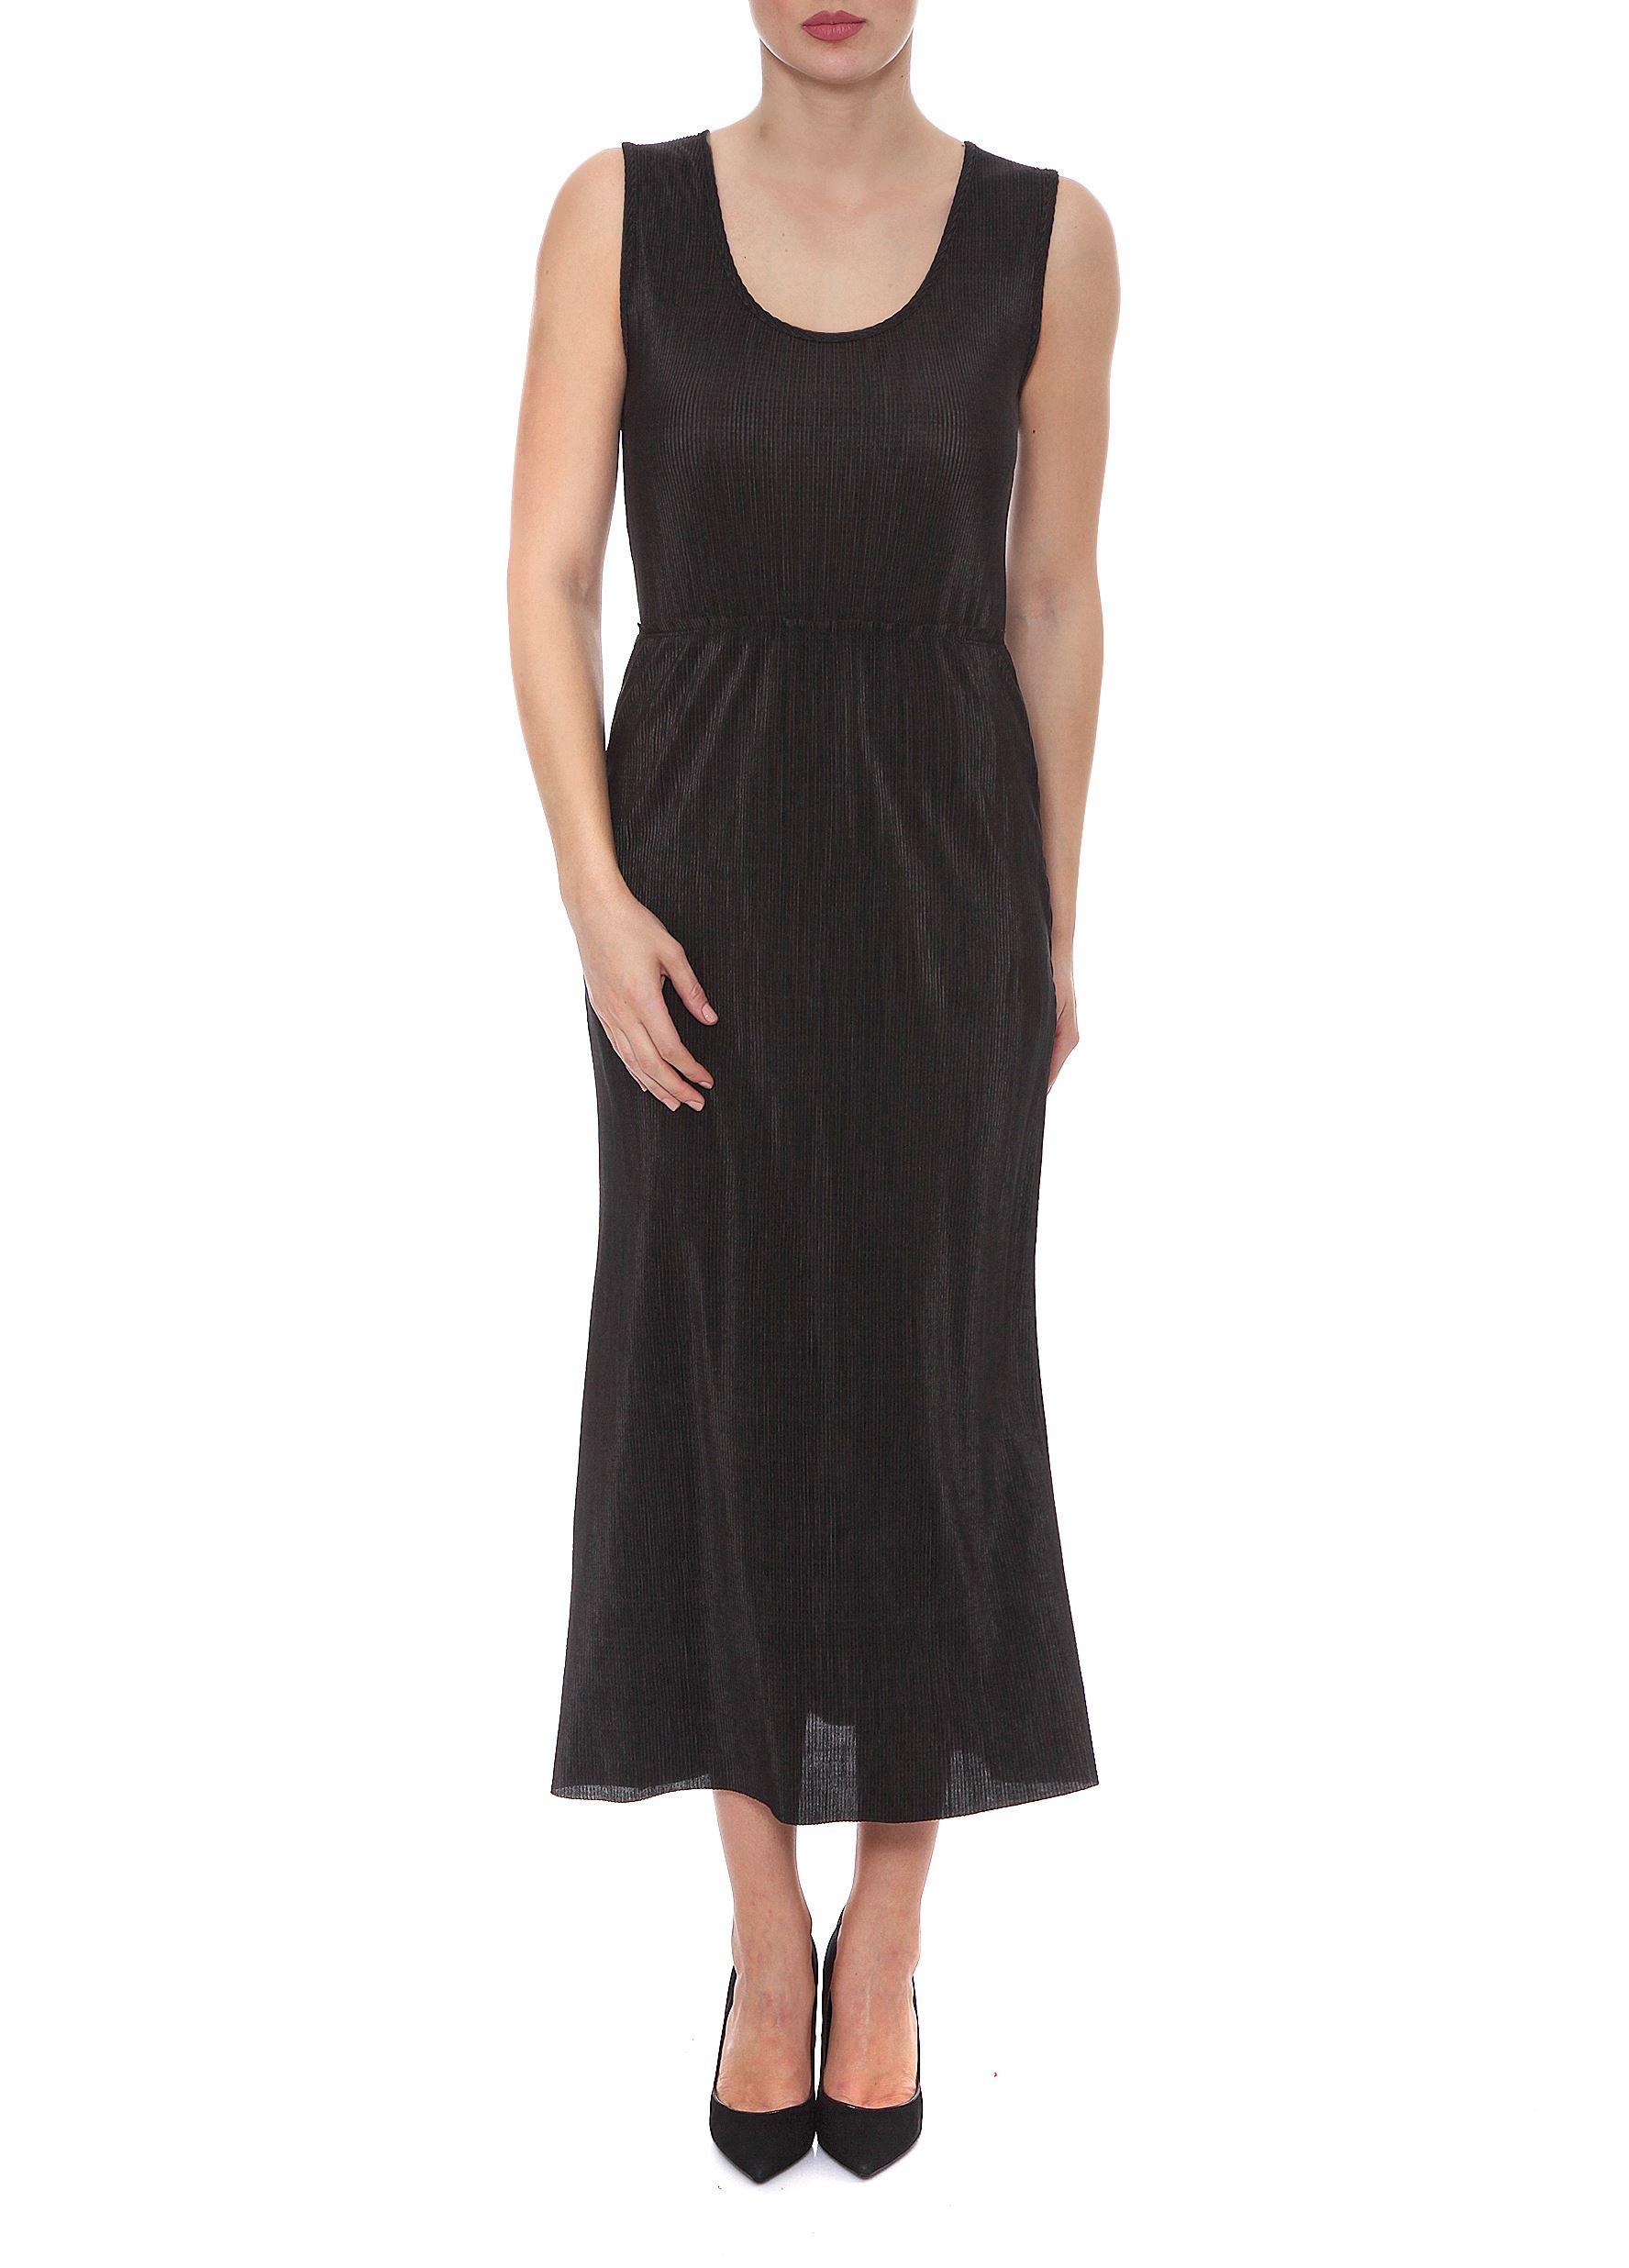 Lynne Vol.3 - Γυναικείο Φόρεμα LYNNE